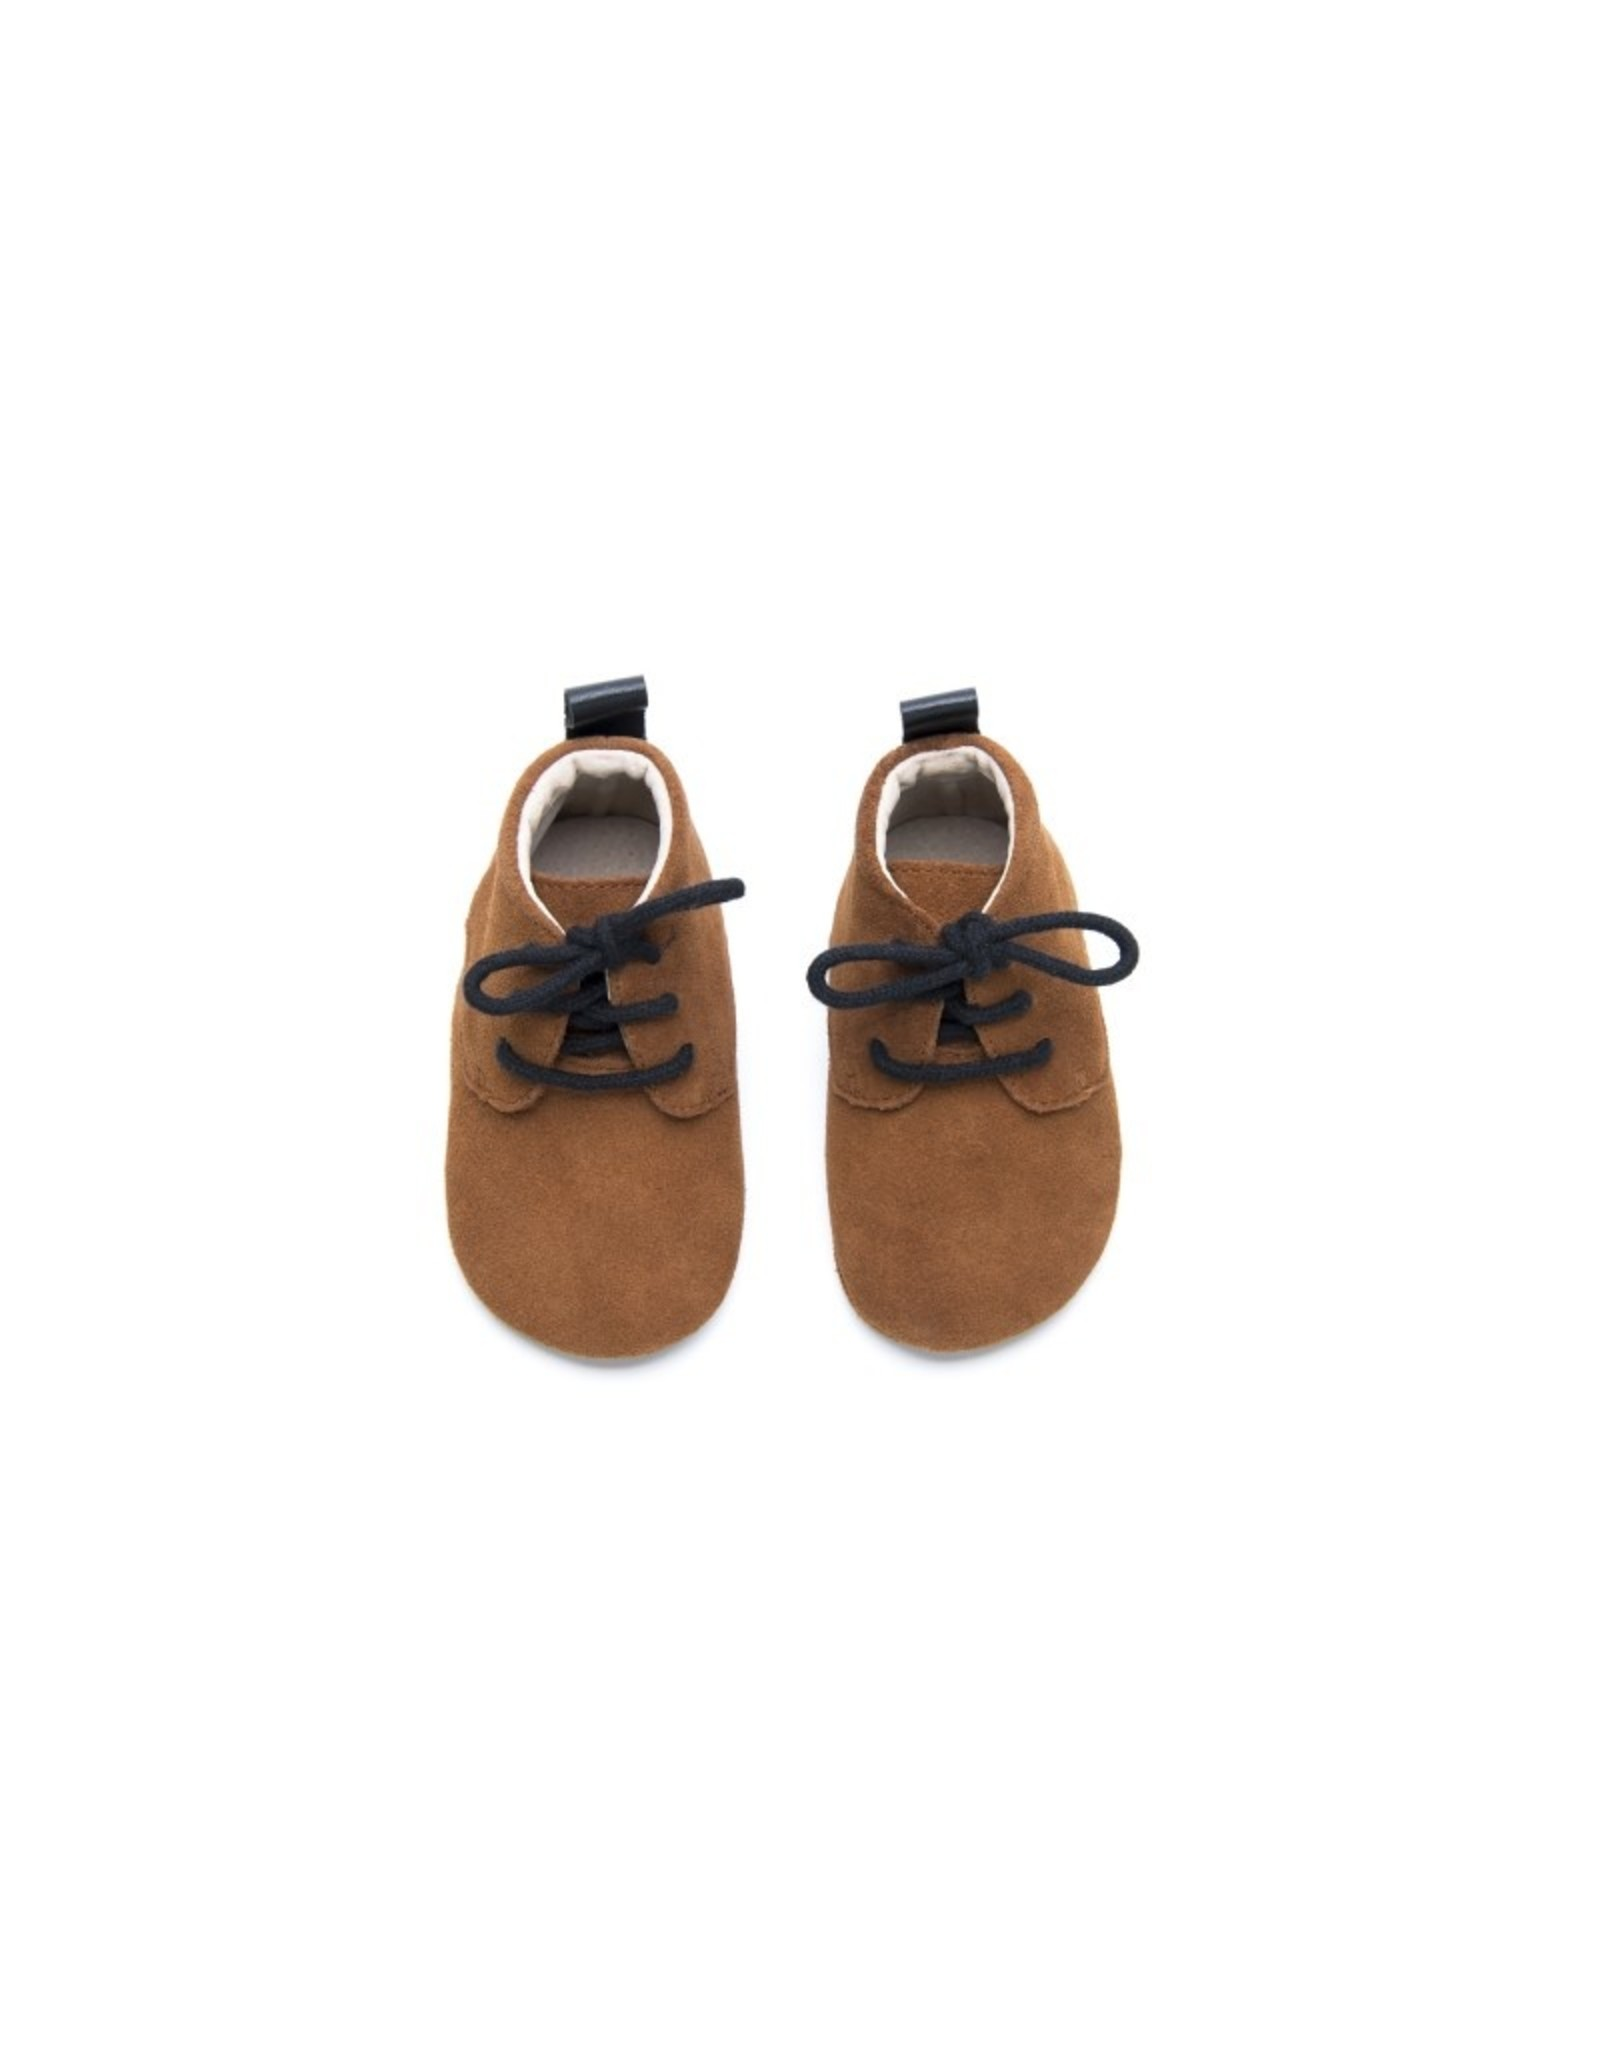 Mockies Mockies Classic Boots Brown/Black